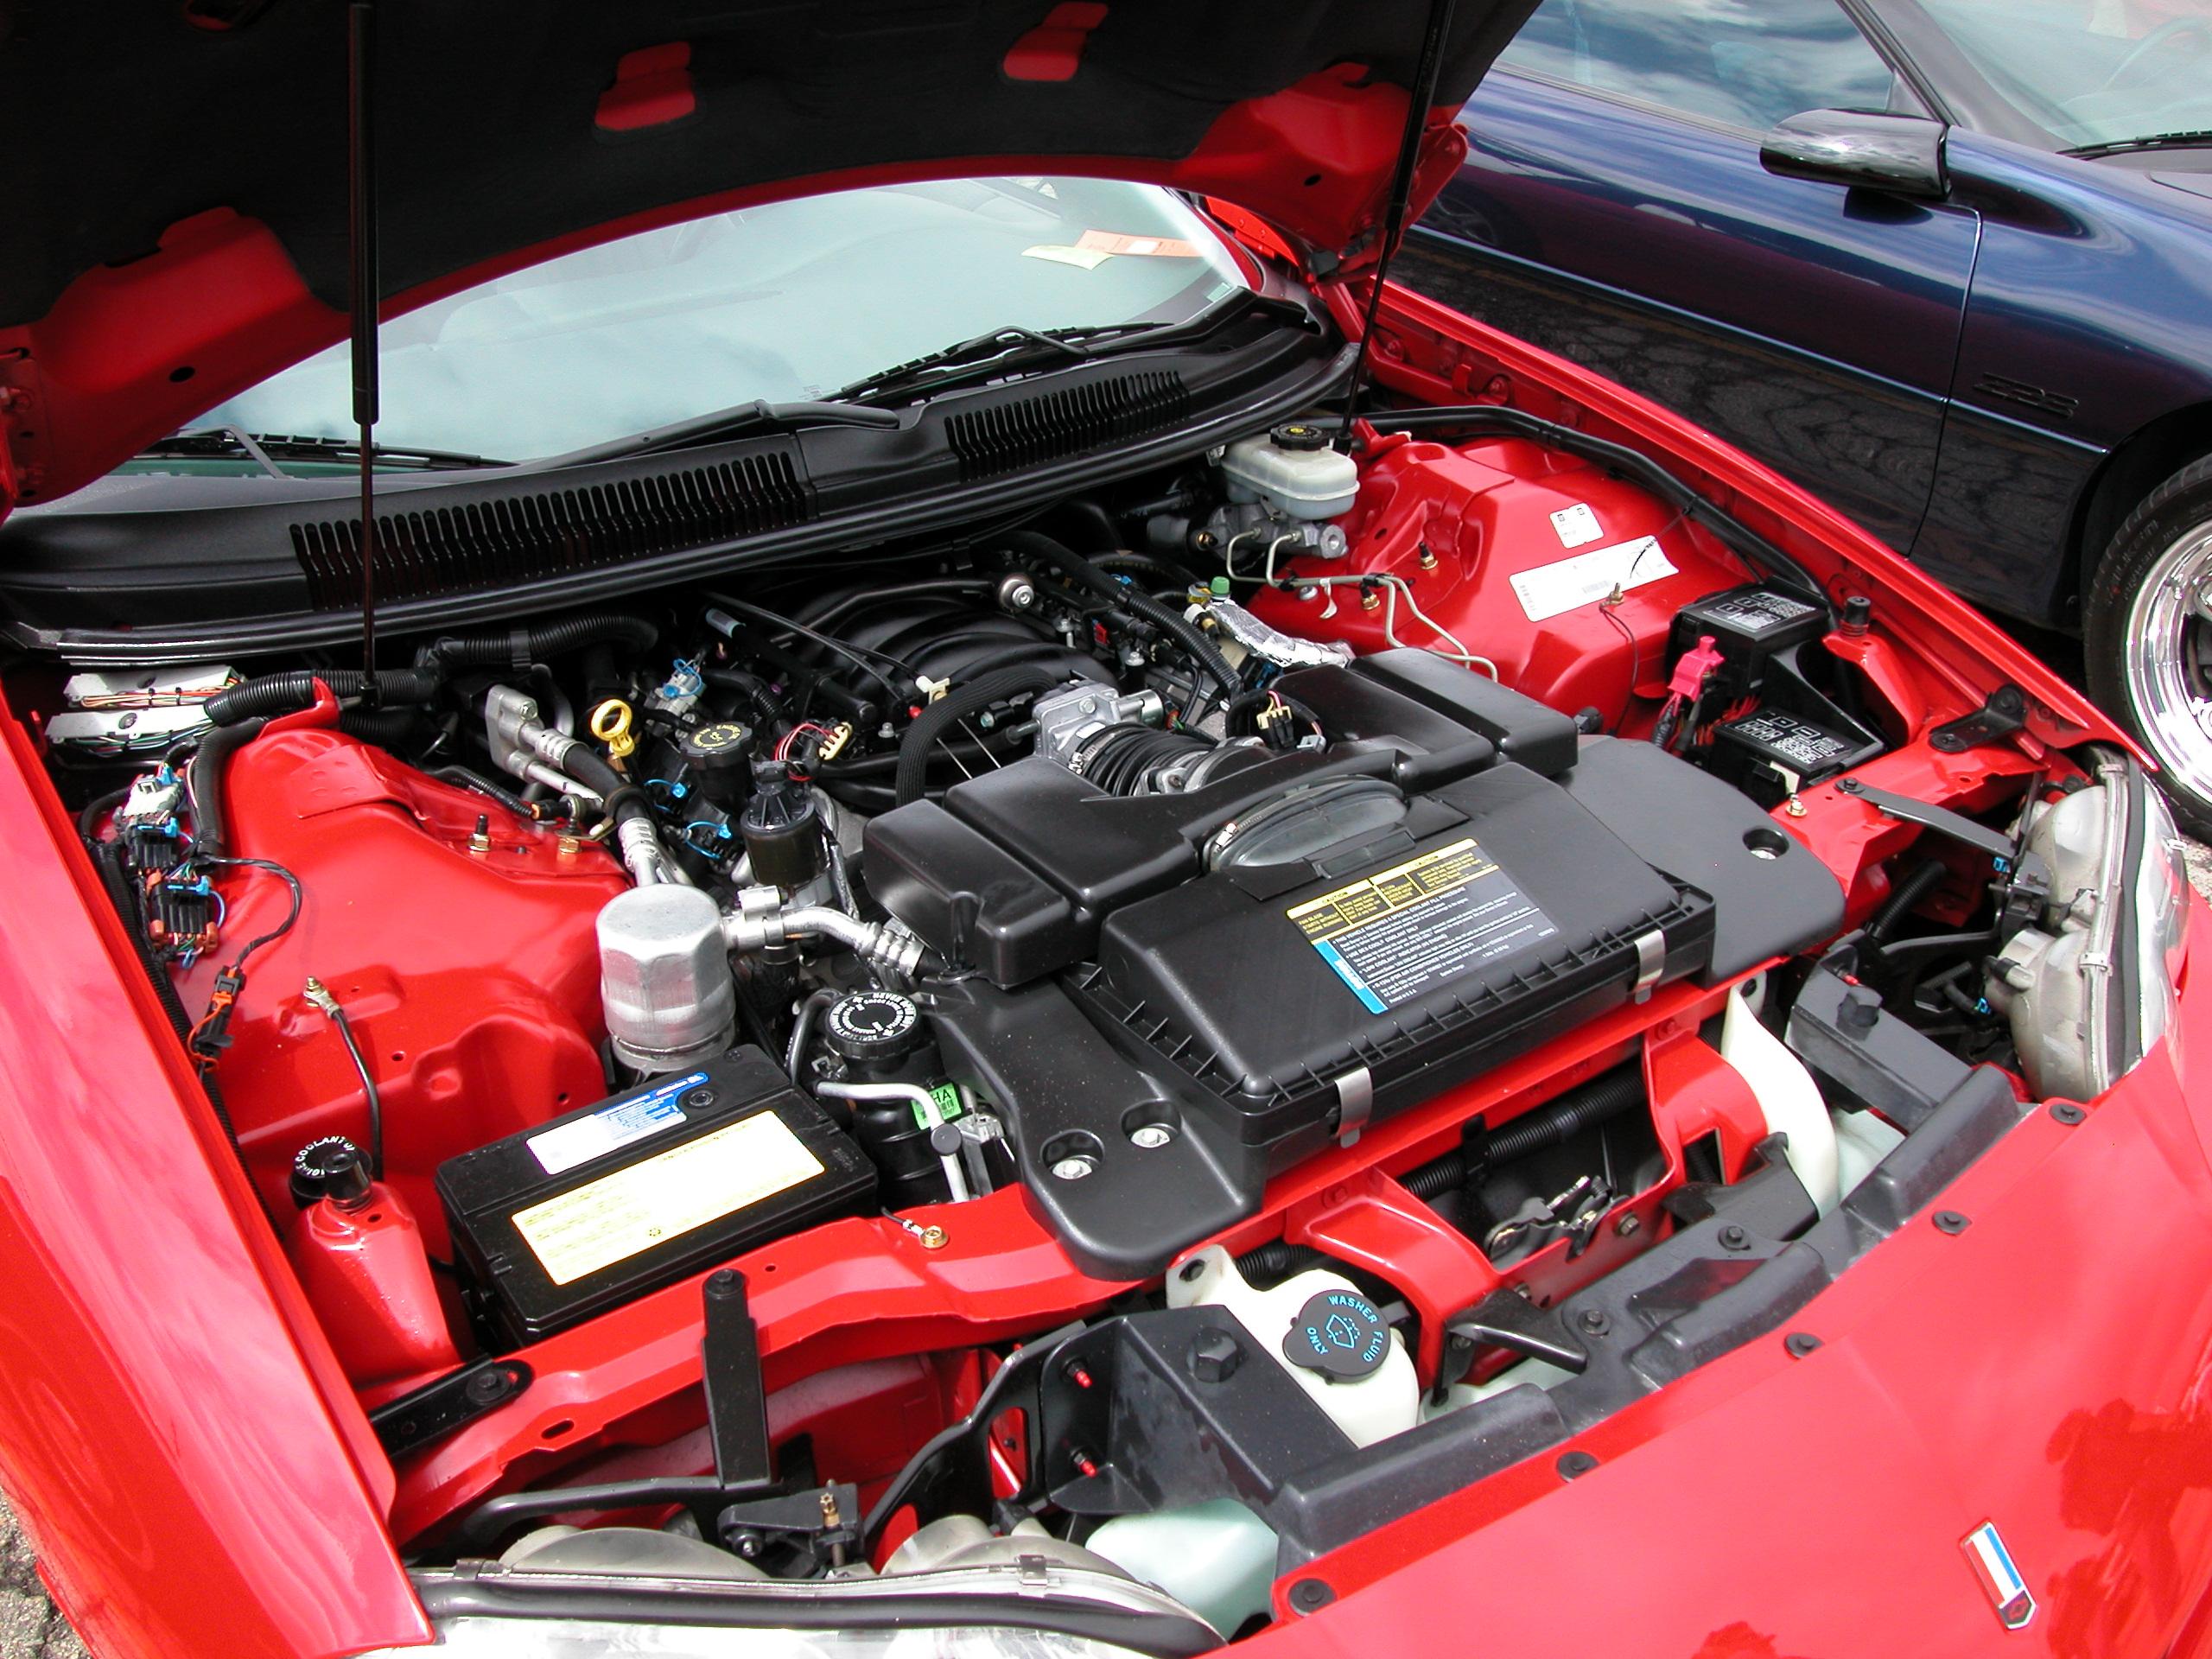 AR_0524] 1993 Gmc V6 Engine Diagram Wiring DiagramUmng Swas Lotap Dome Mohammedshrine Librar Wiring 101